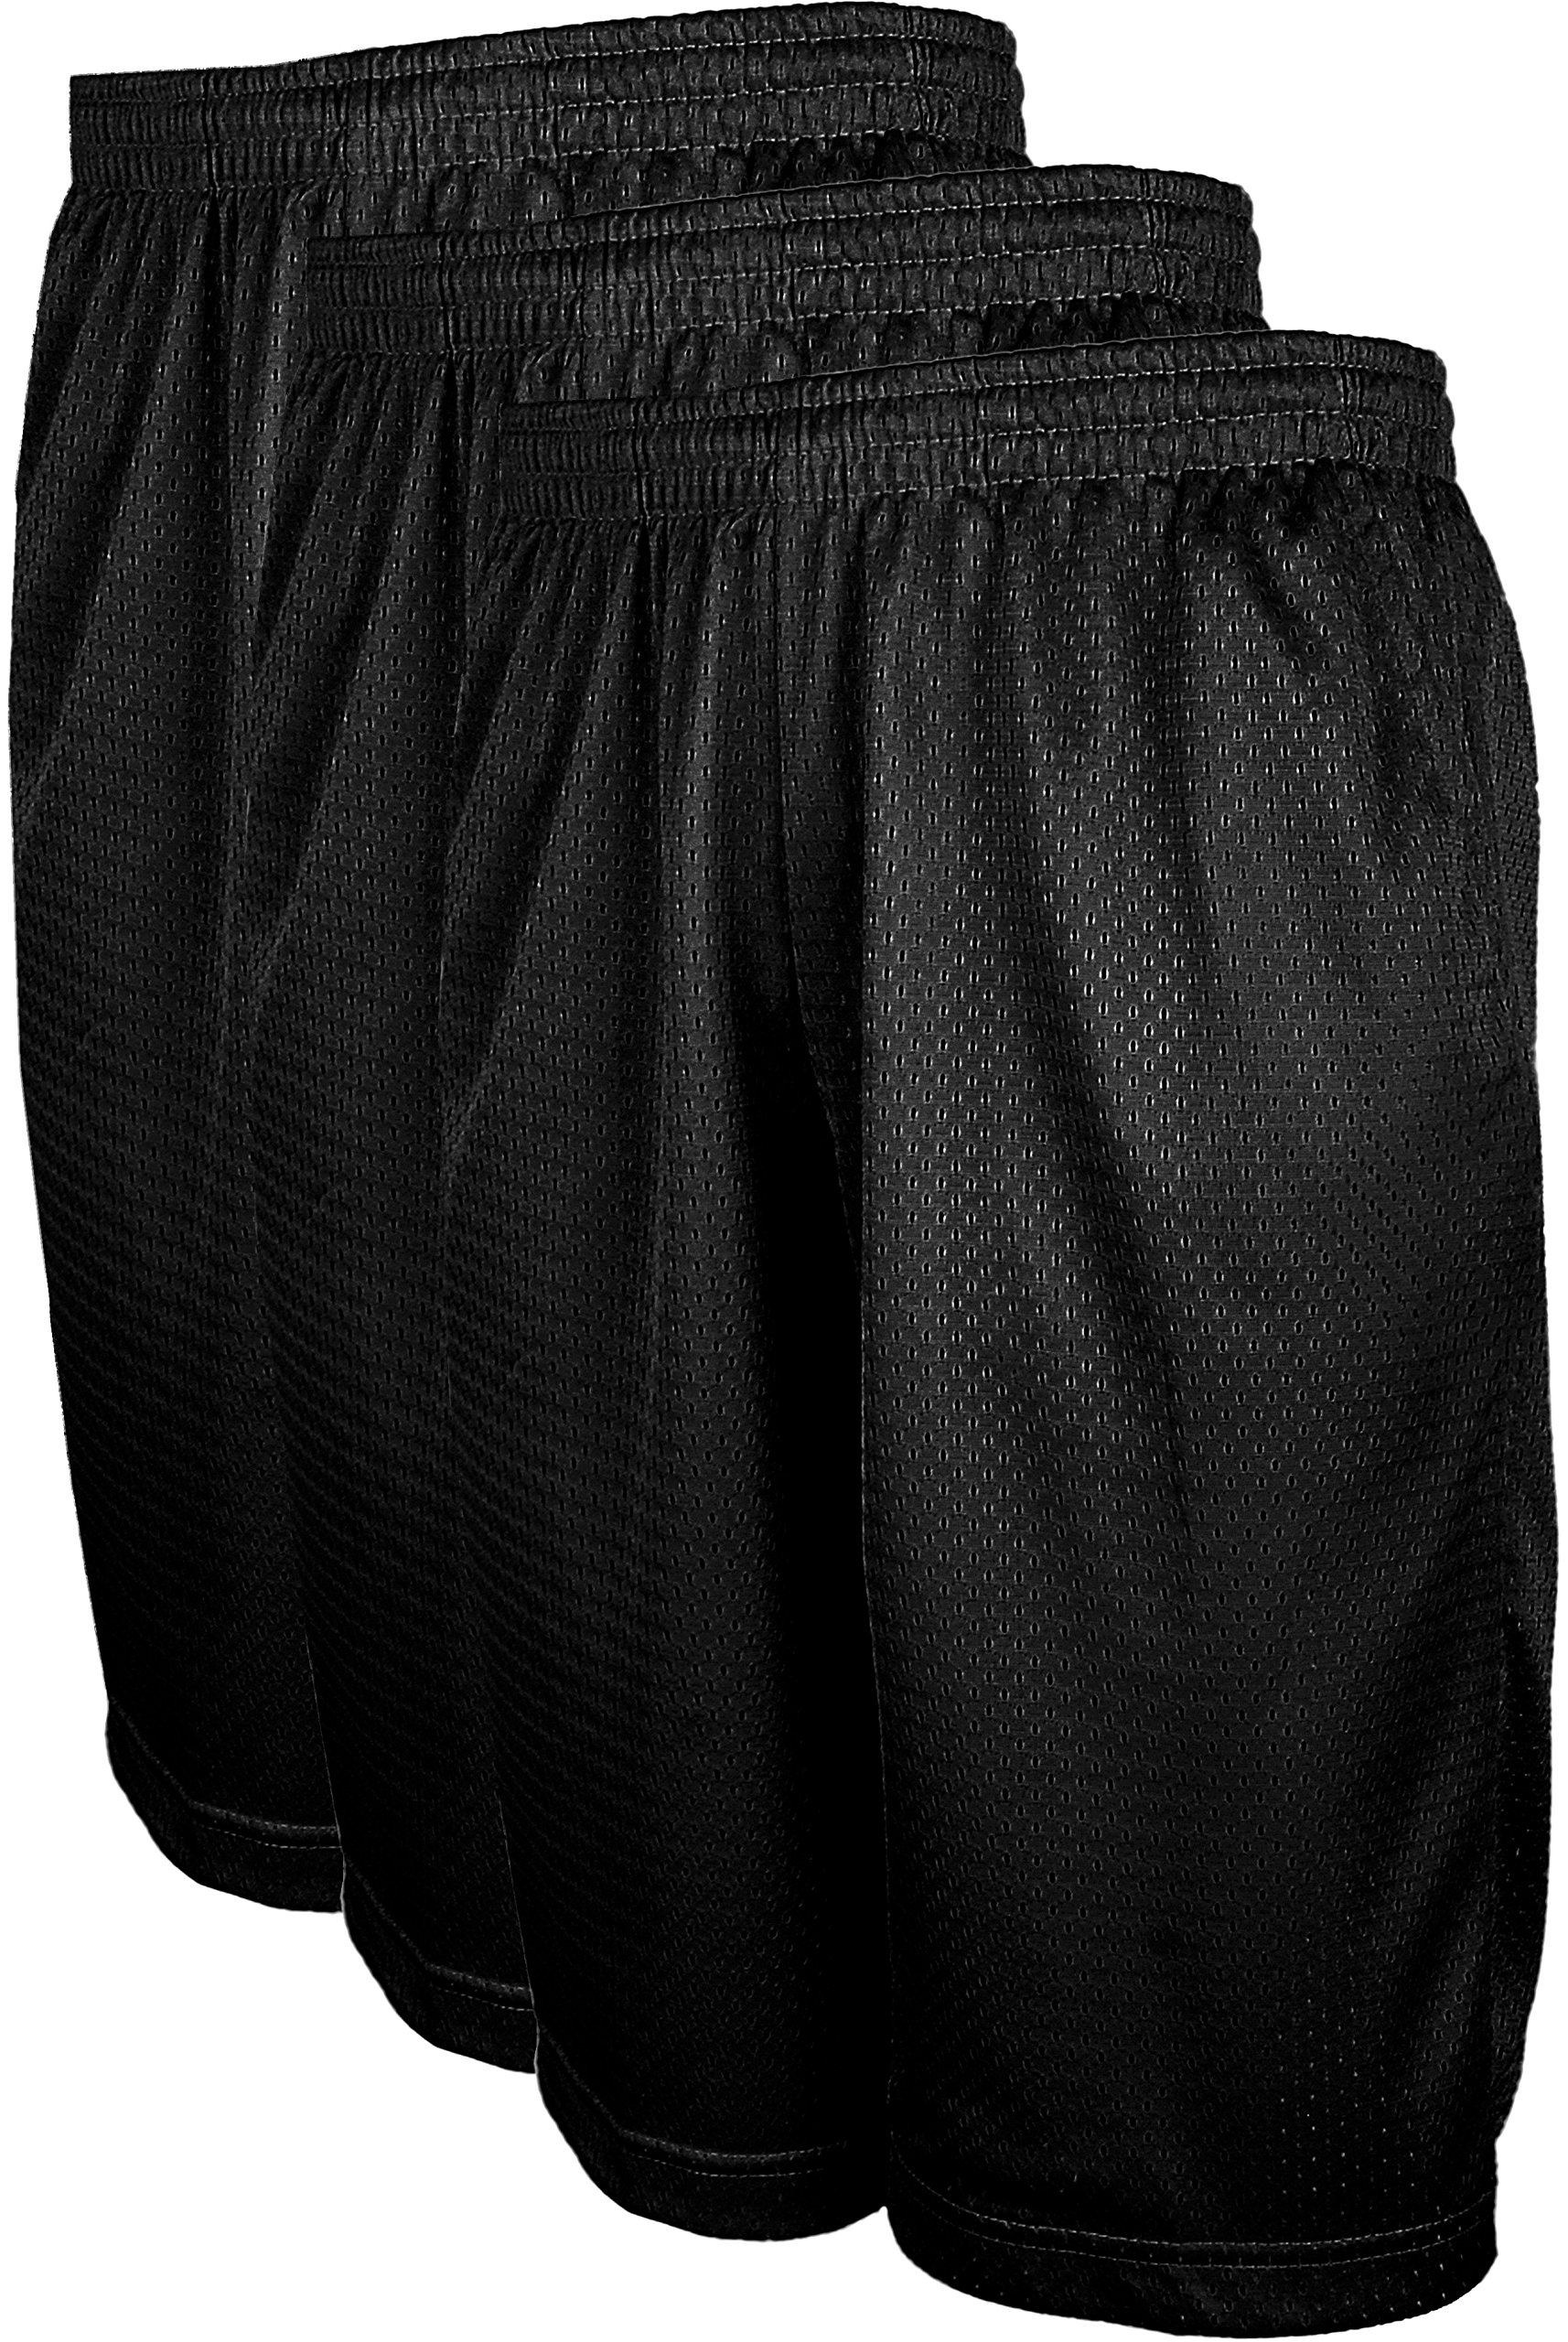 ViiViiKay Men's Athletic Basketball Shorts - Mesh Workout Gym Shorts with Pocket SET3_BLK_BLK_BLK 3XL